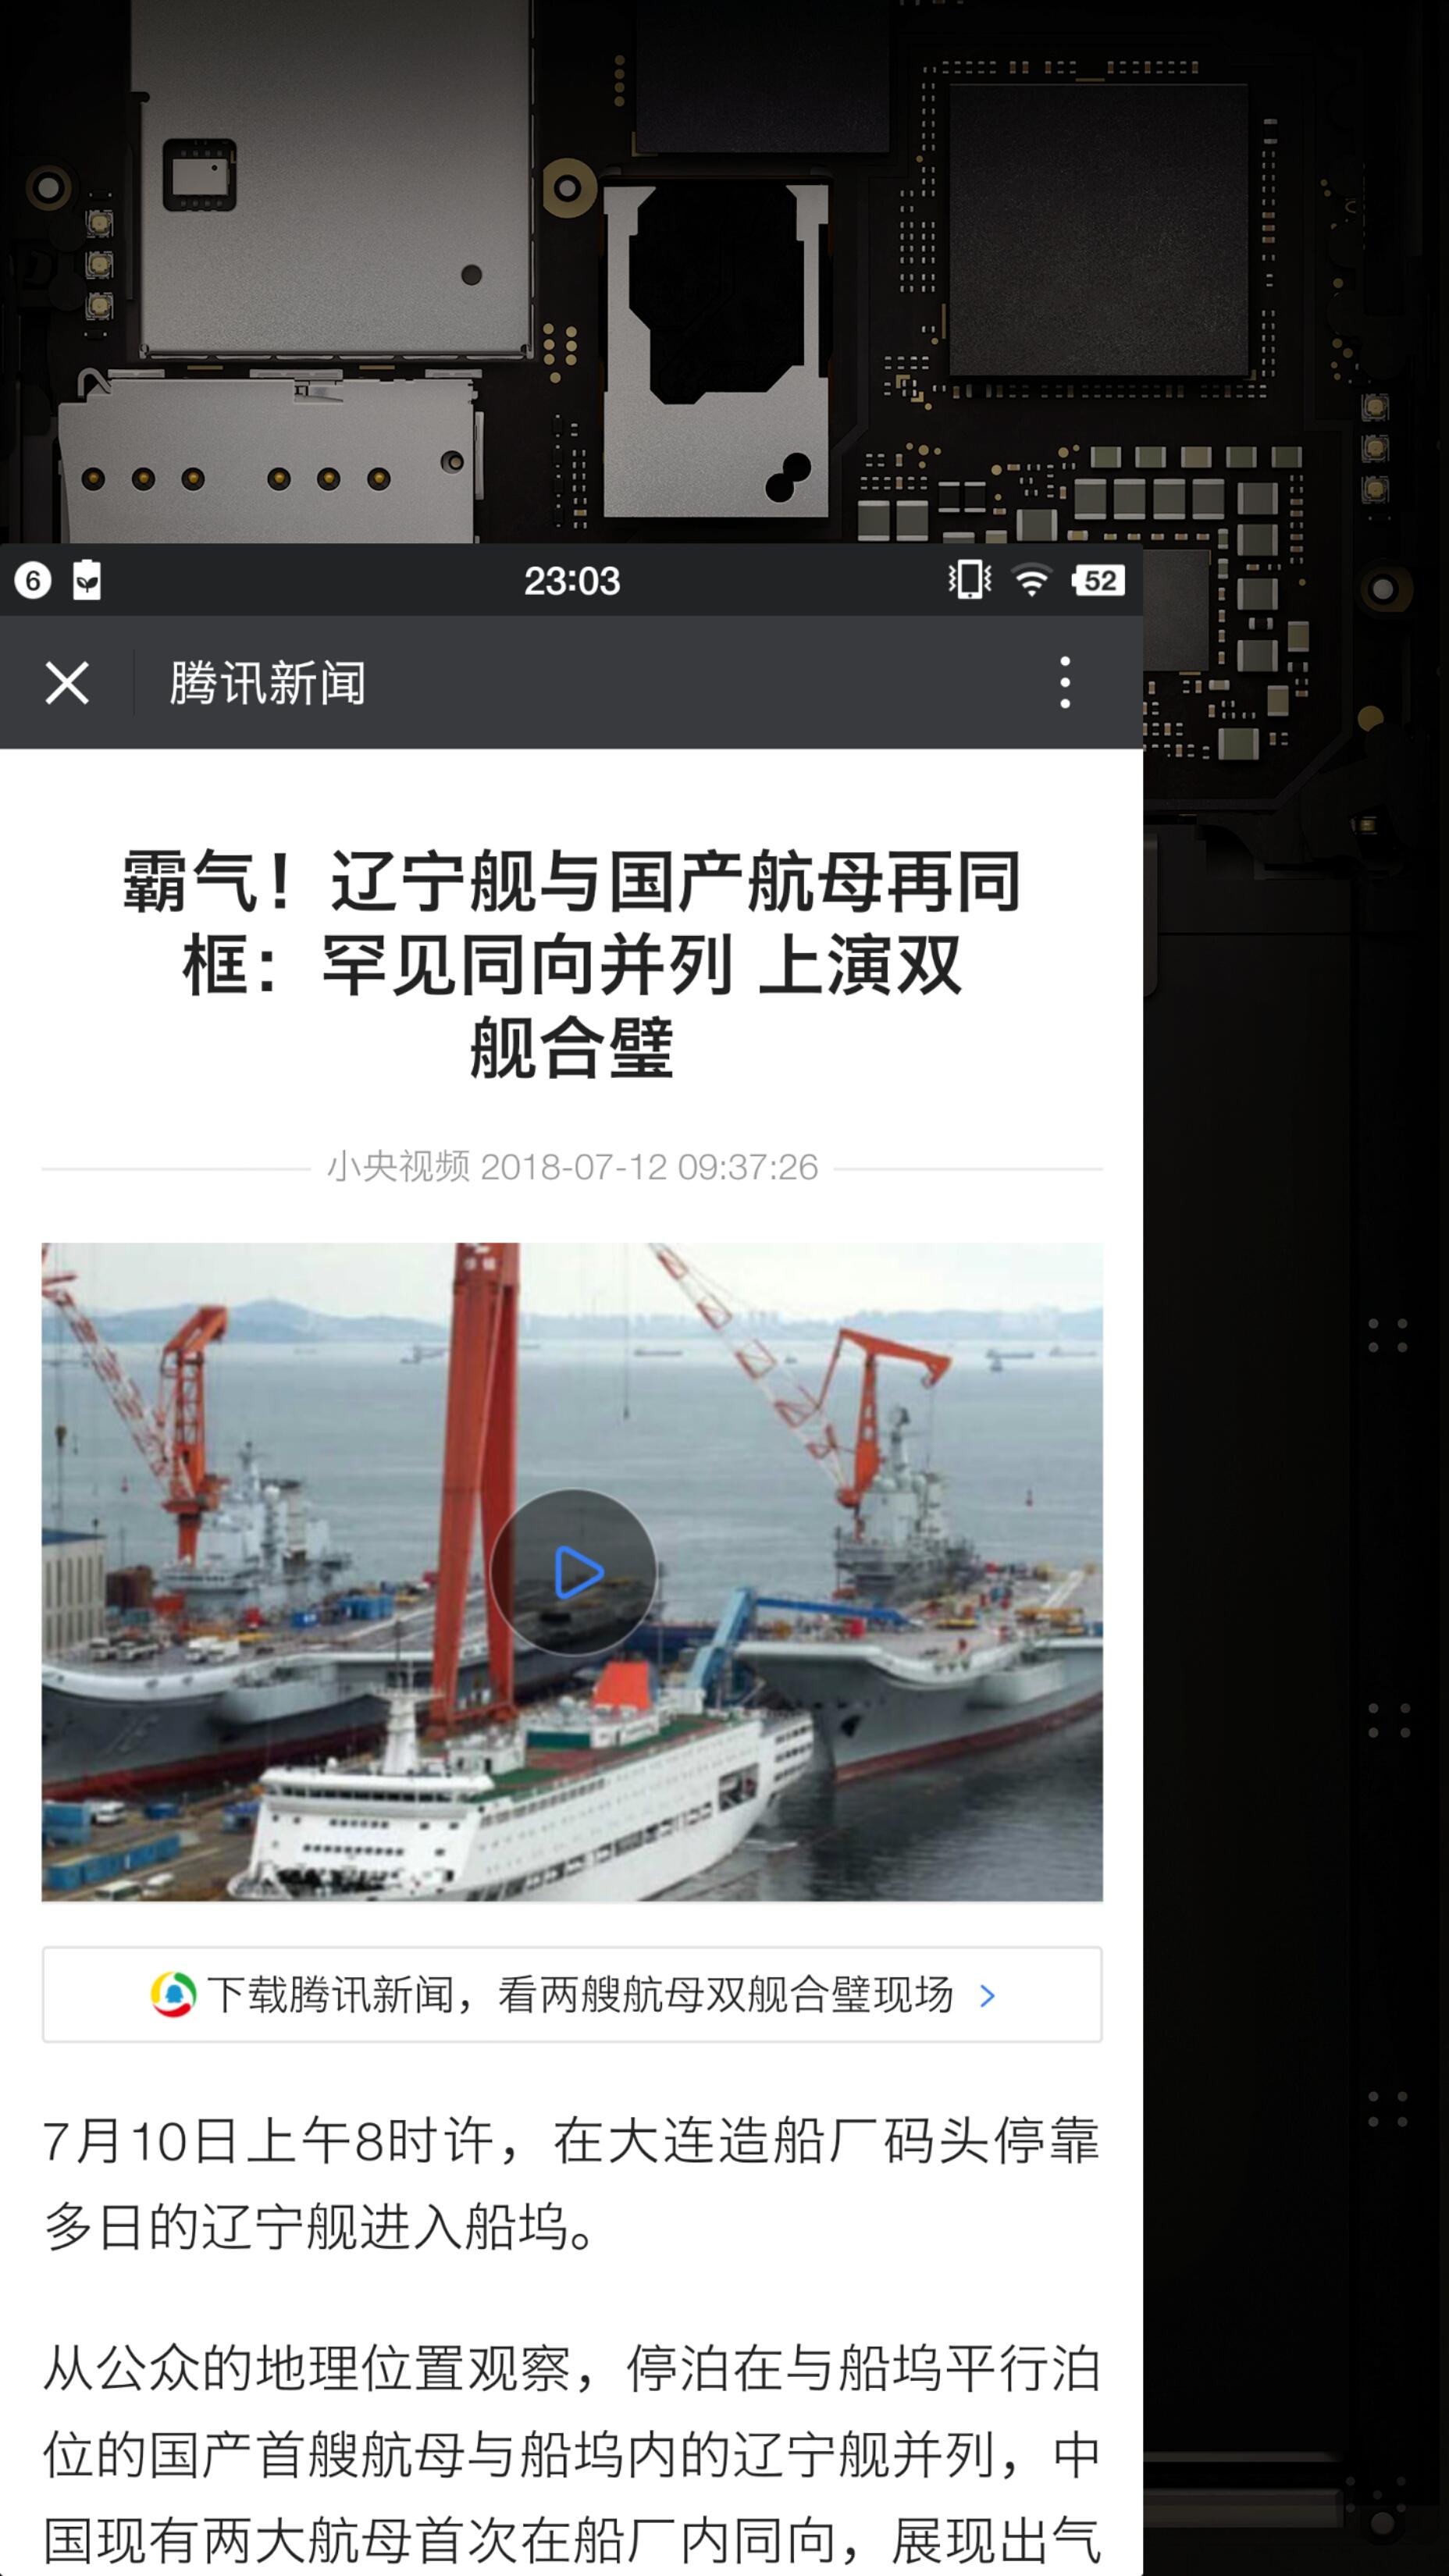 Screenshot_2018-07-12-23-03-34-608_??.png